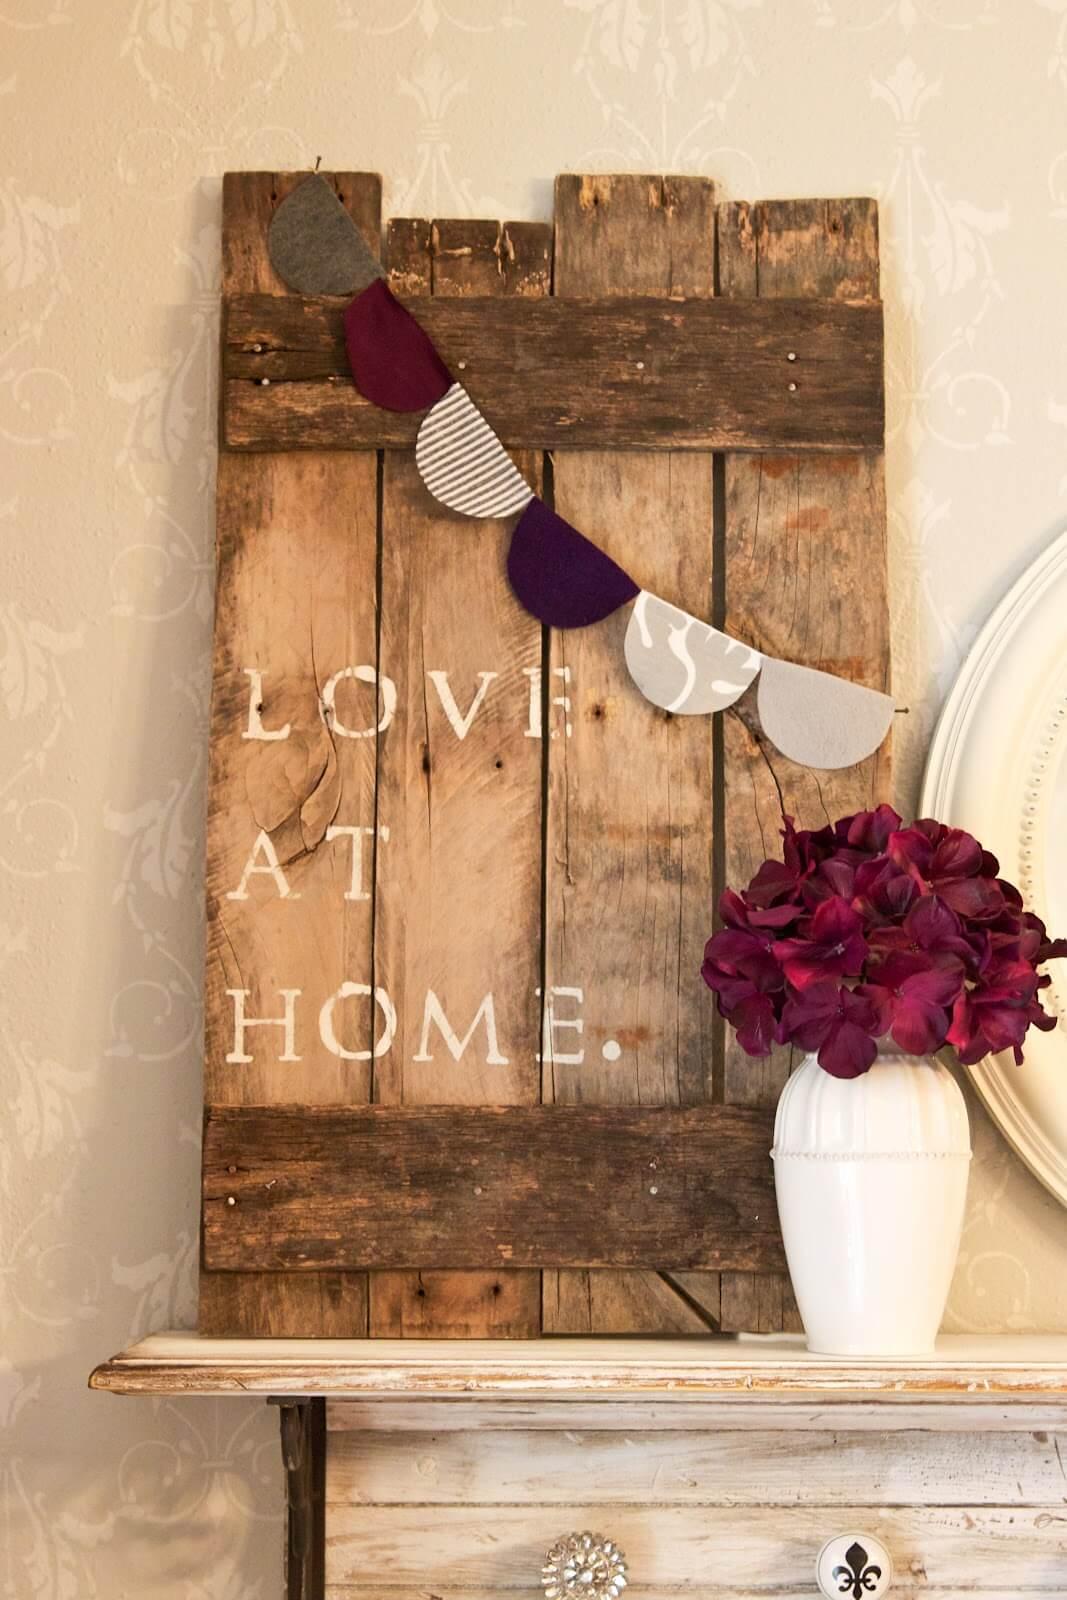 Love at Home Pallet Art